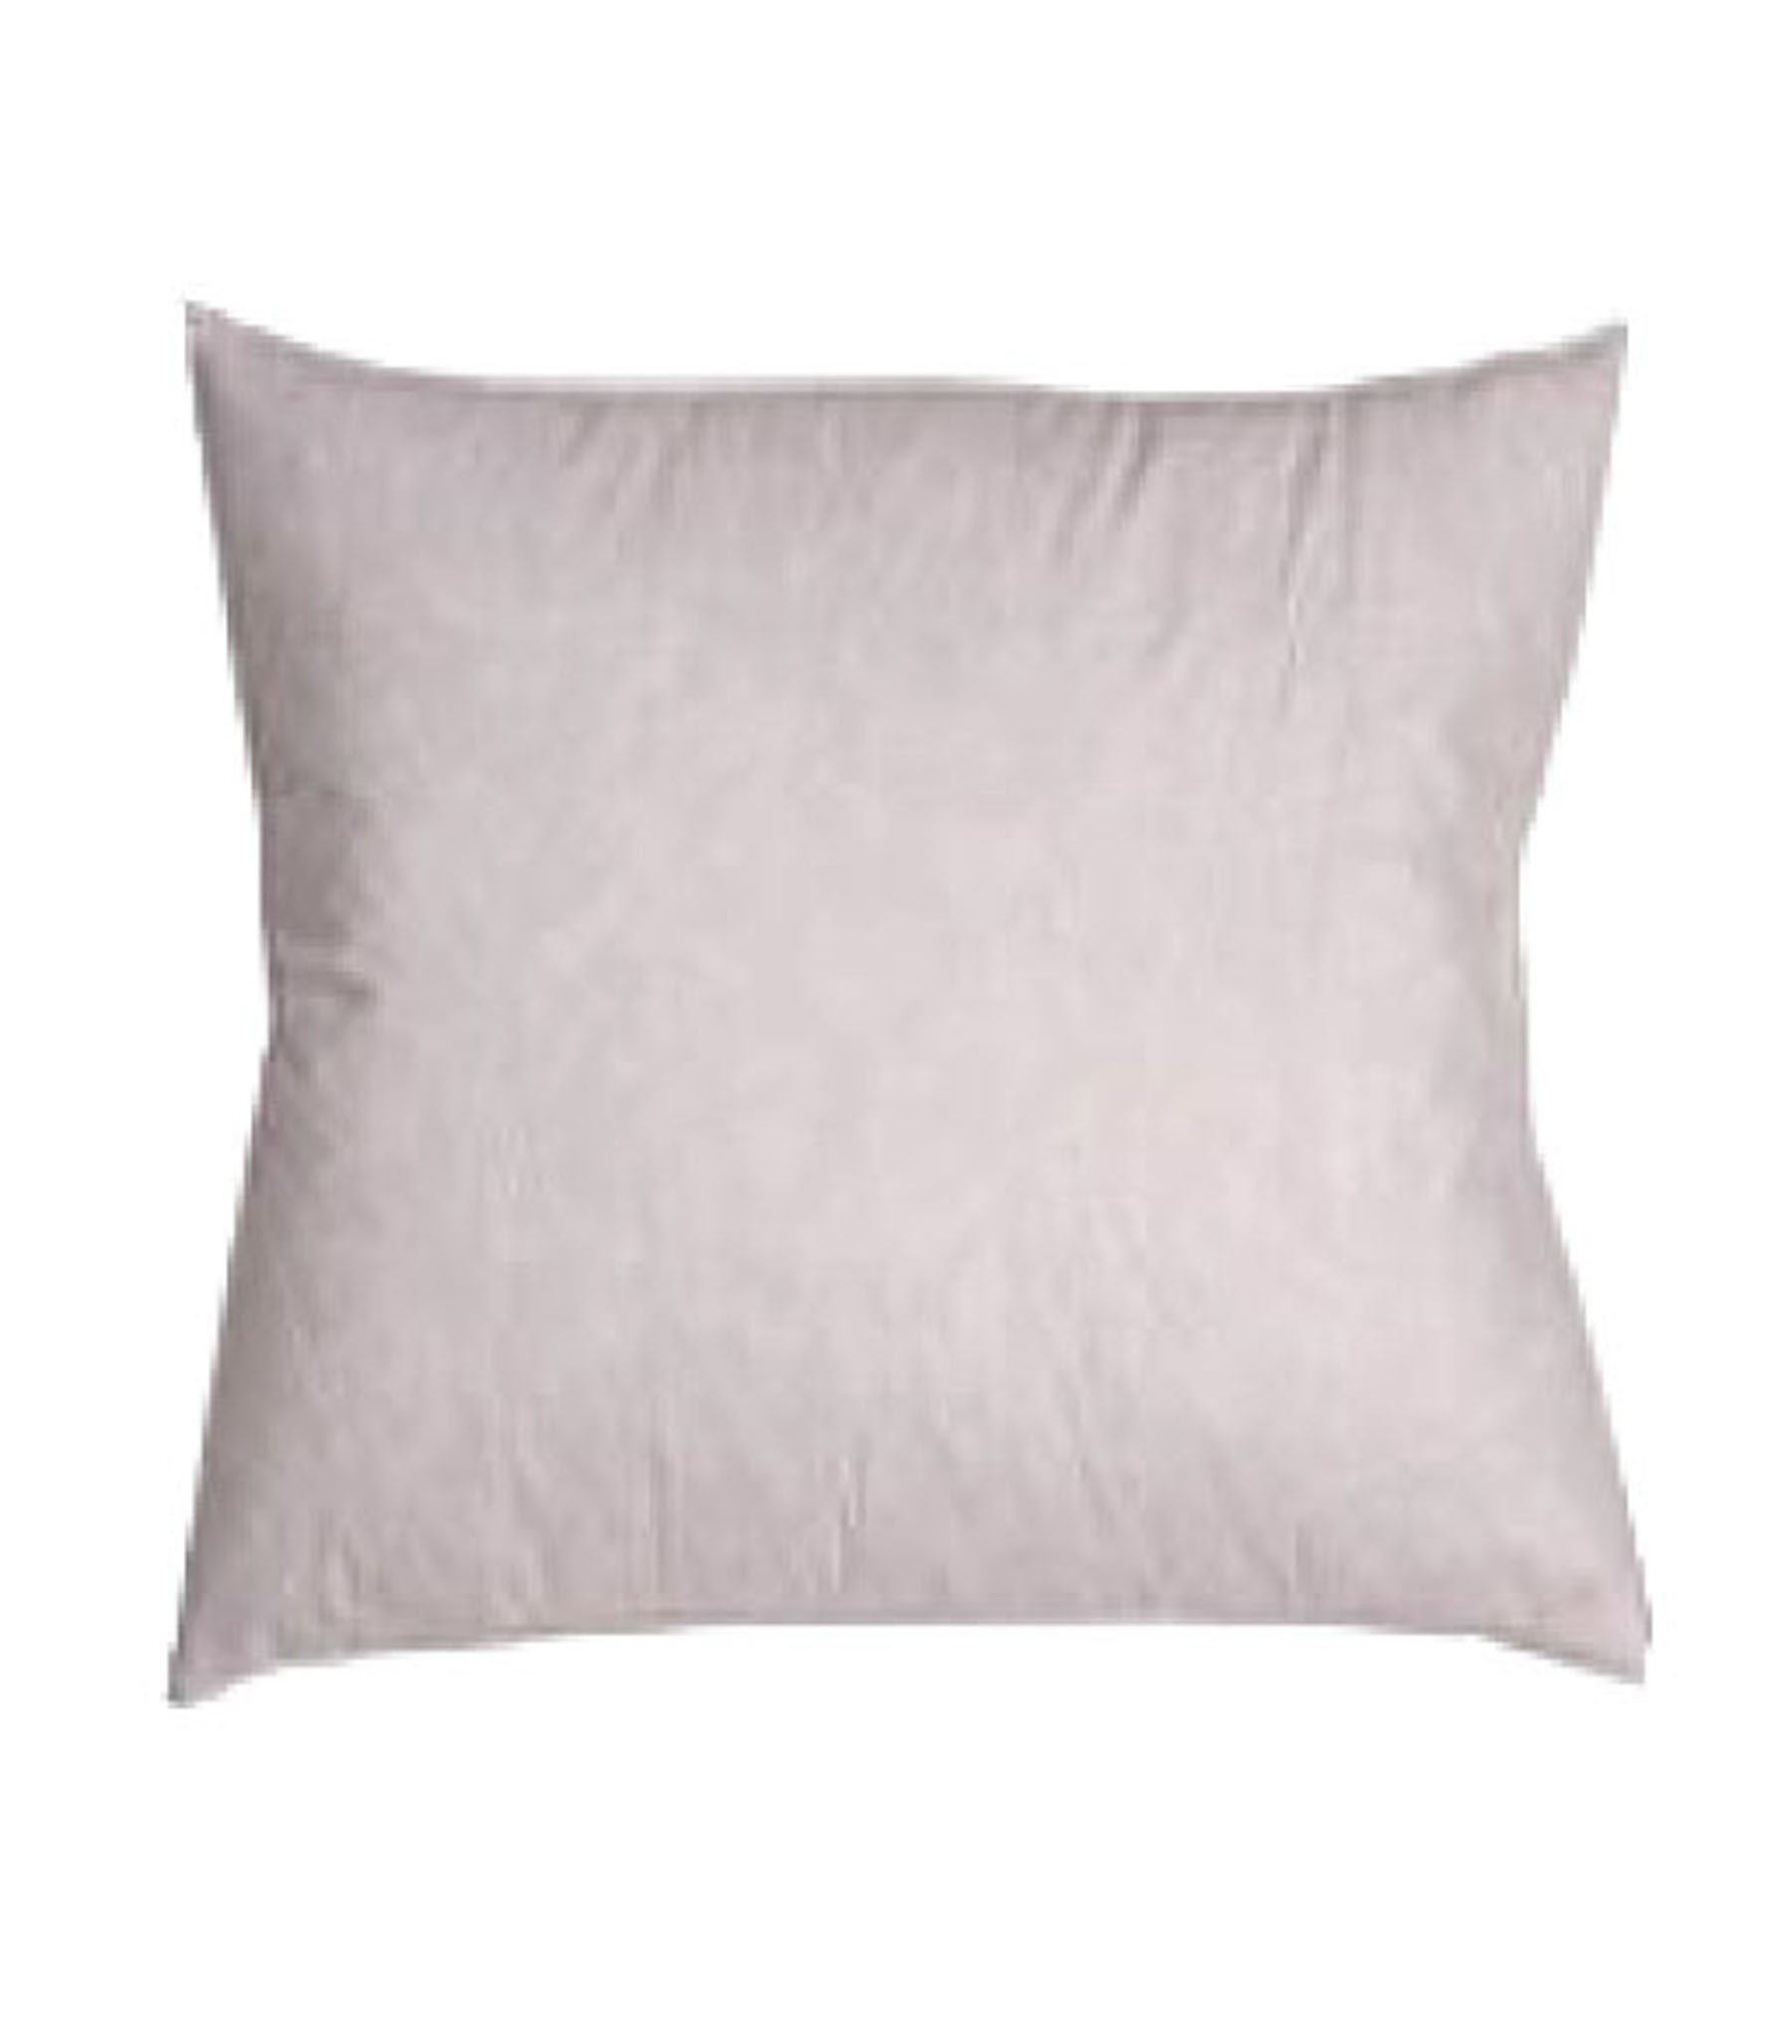 white square pillows online